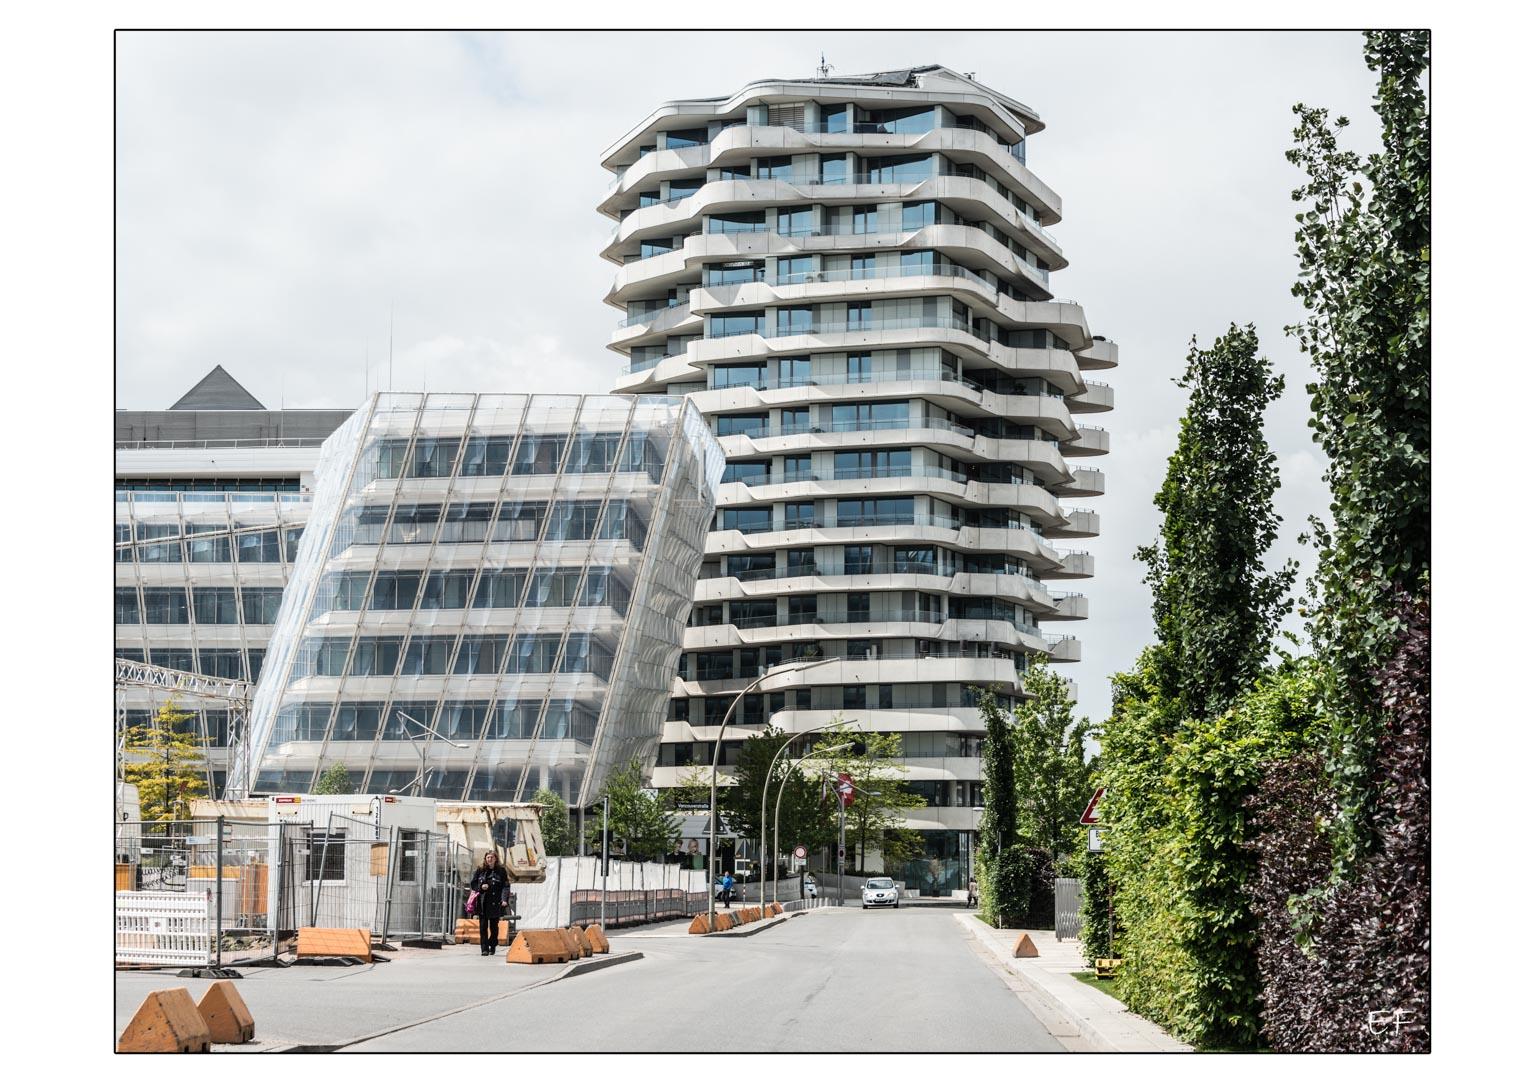 Architekten Jena hafencity in hamburg erwinfreund jena